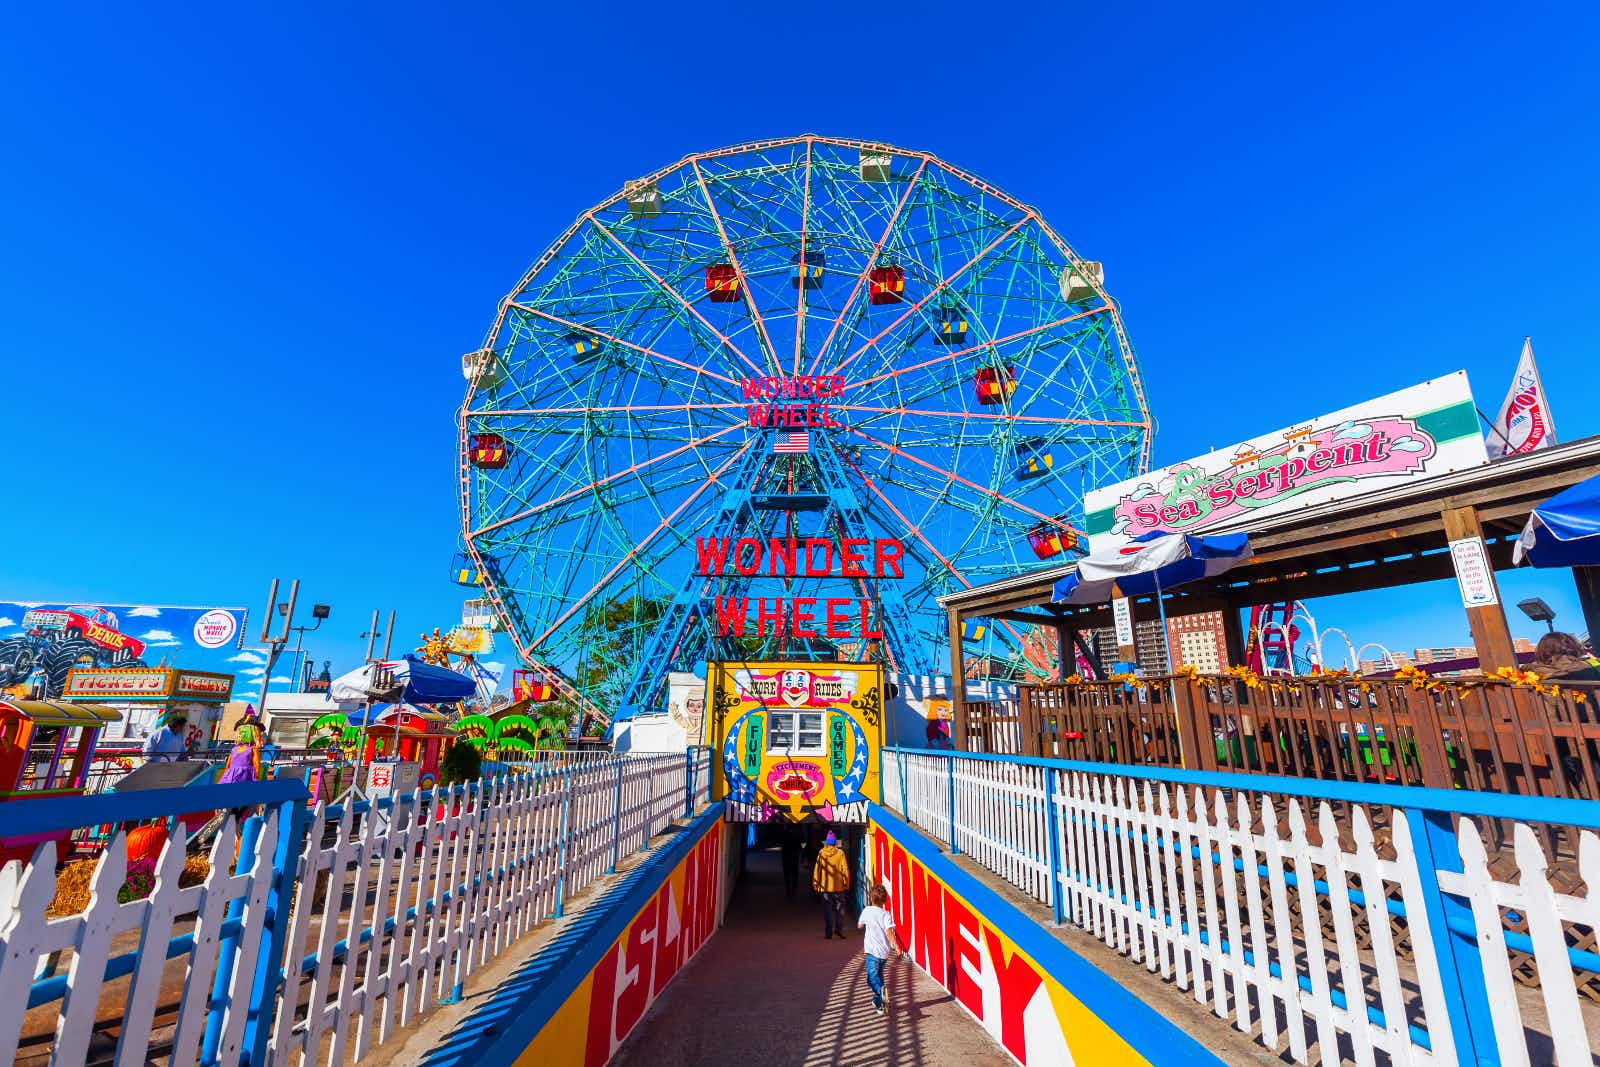 The iconic Wonder Wheel of Coney Island still stands tall ©Christian Mueller / Shutterstock